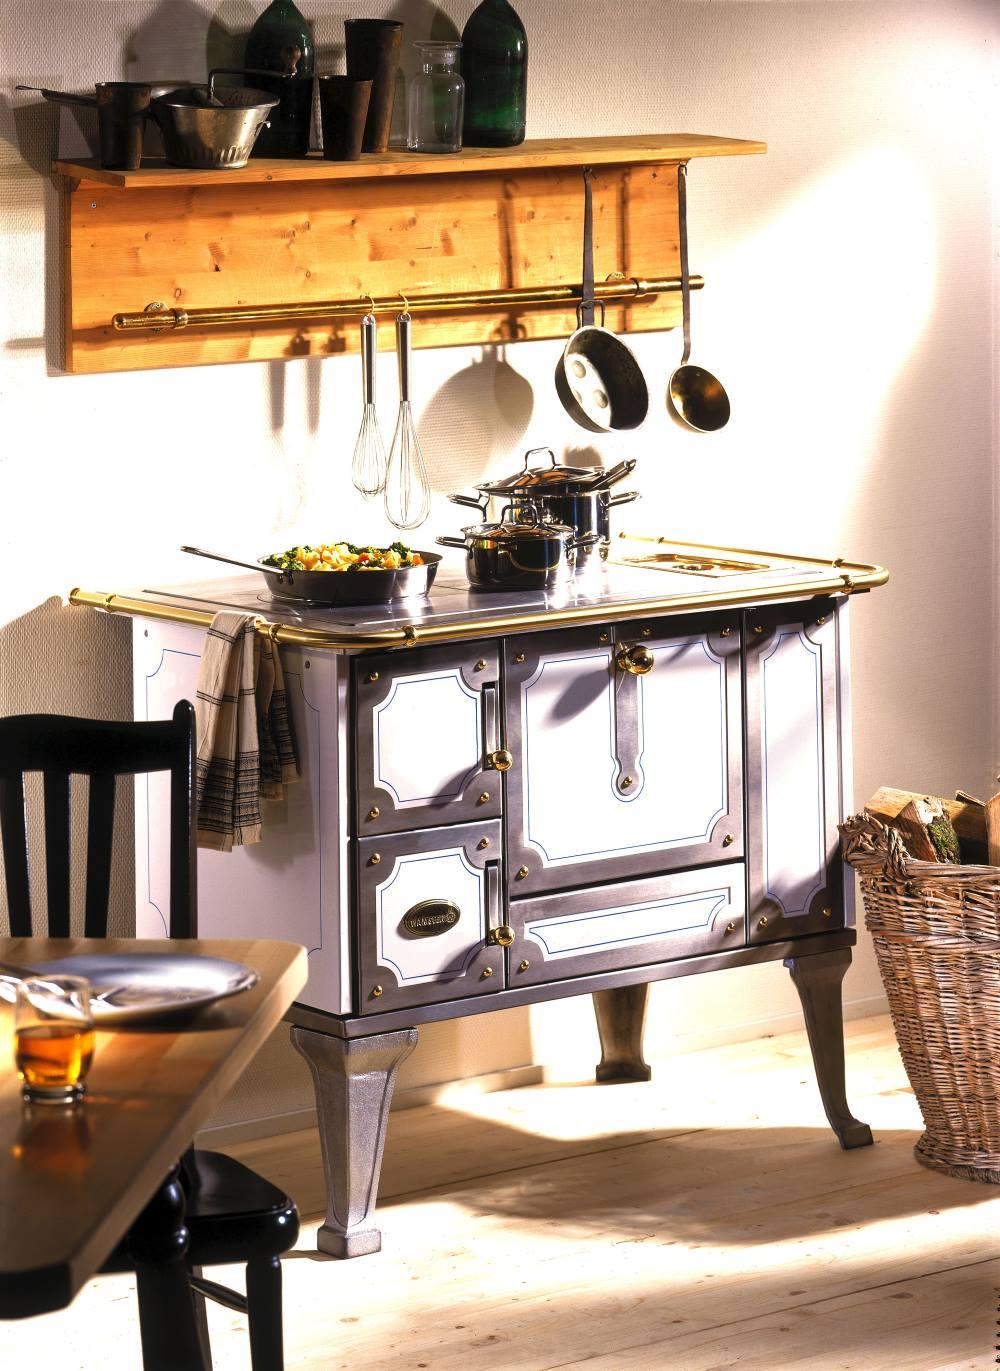 informationsseite h ttich wamsler k138j k chenherd wei ambiente line jubil umsherd. Black Bedroom Furniture Sets. Home Design Ideas